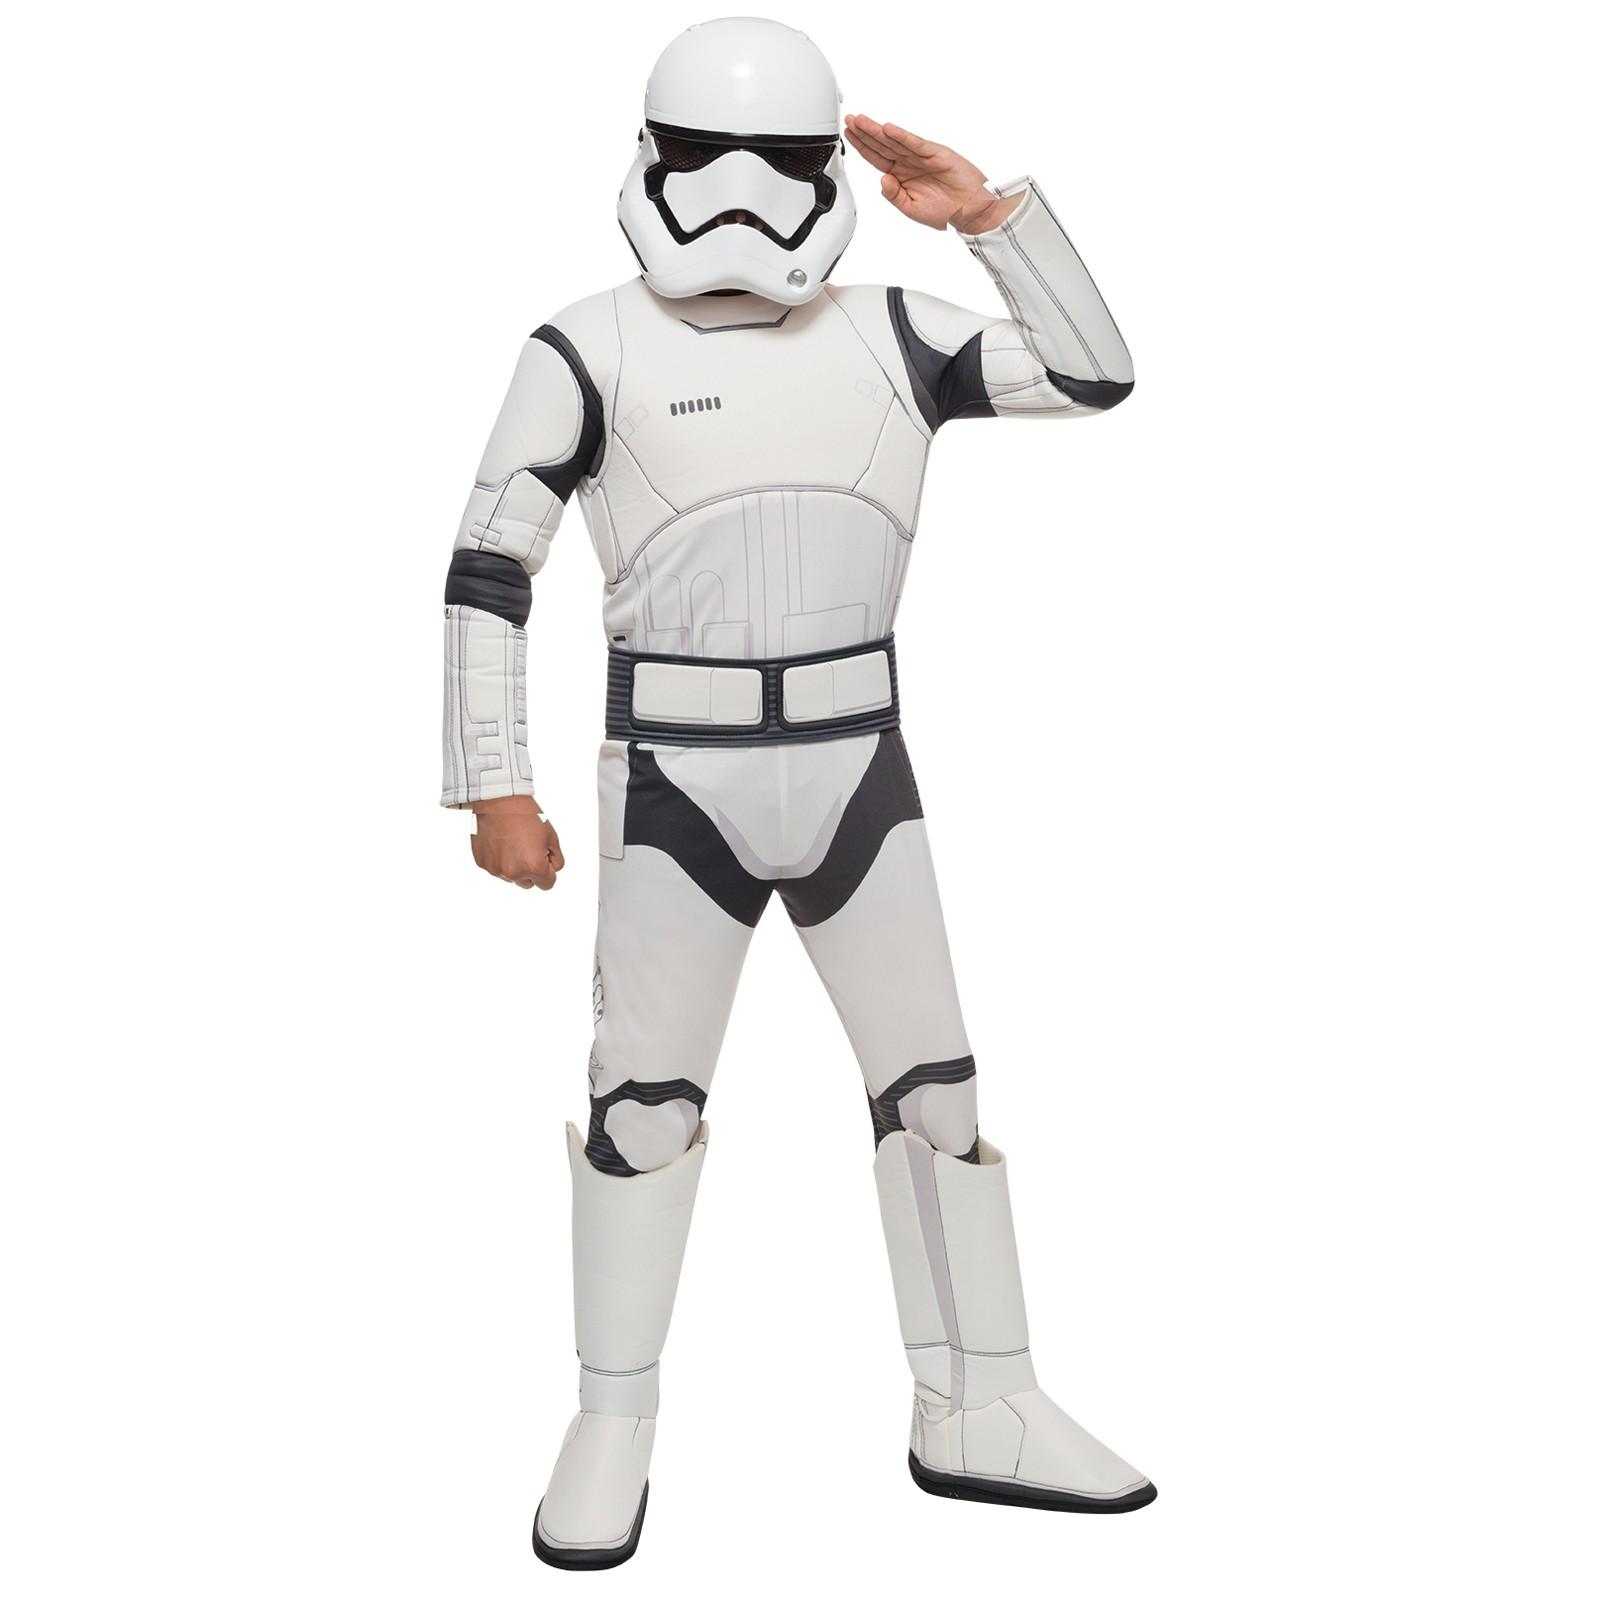 Marvelous Star Wars: The Force Awakens   Stormtrooper Deluxe Child Costume